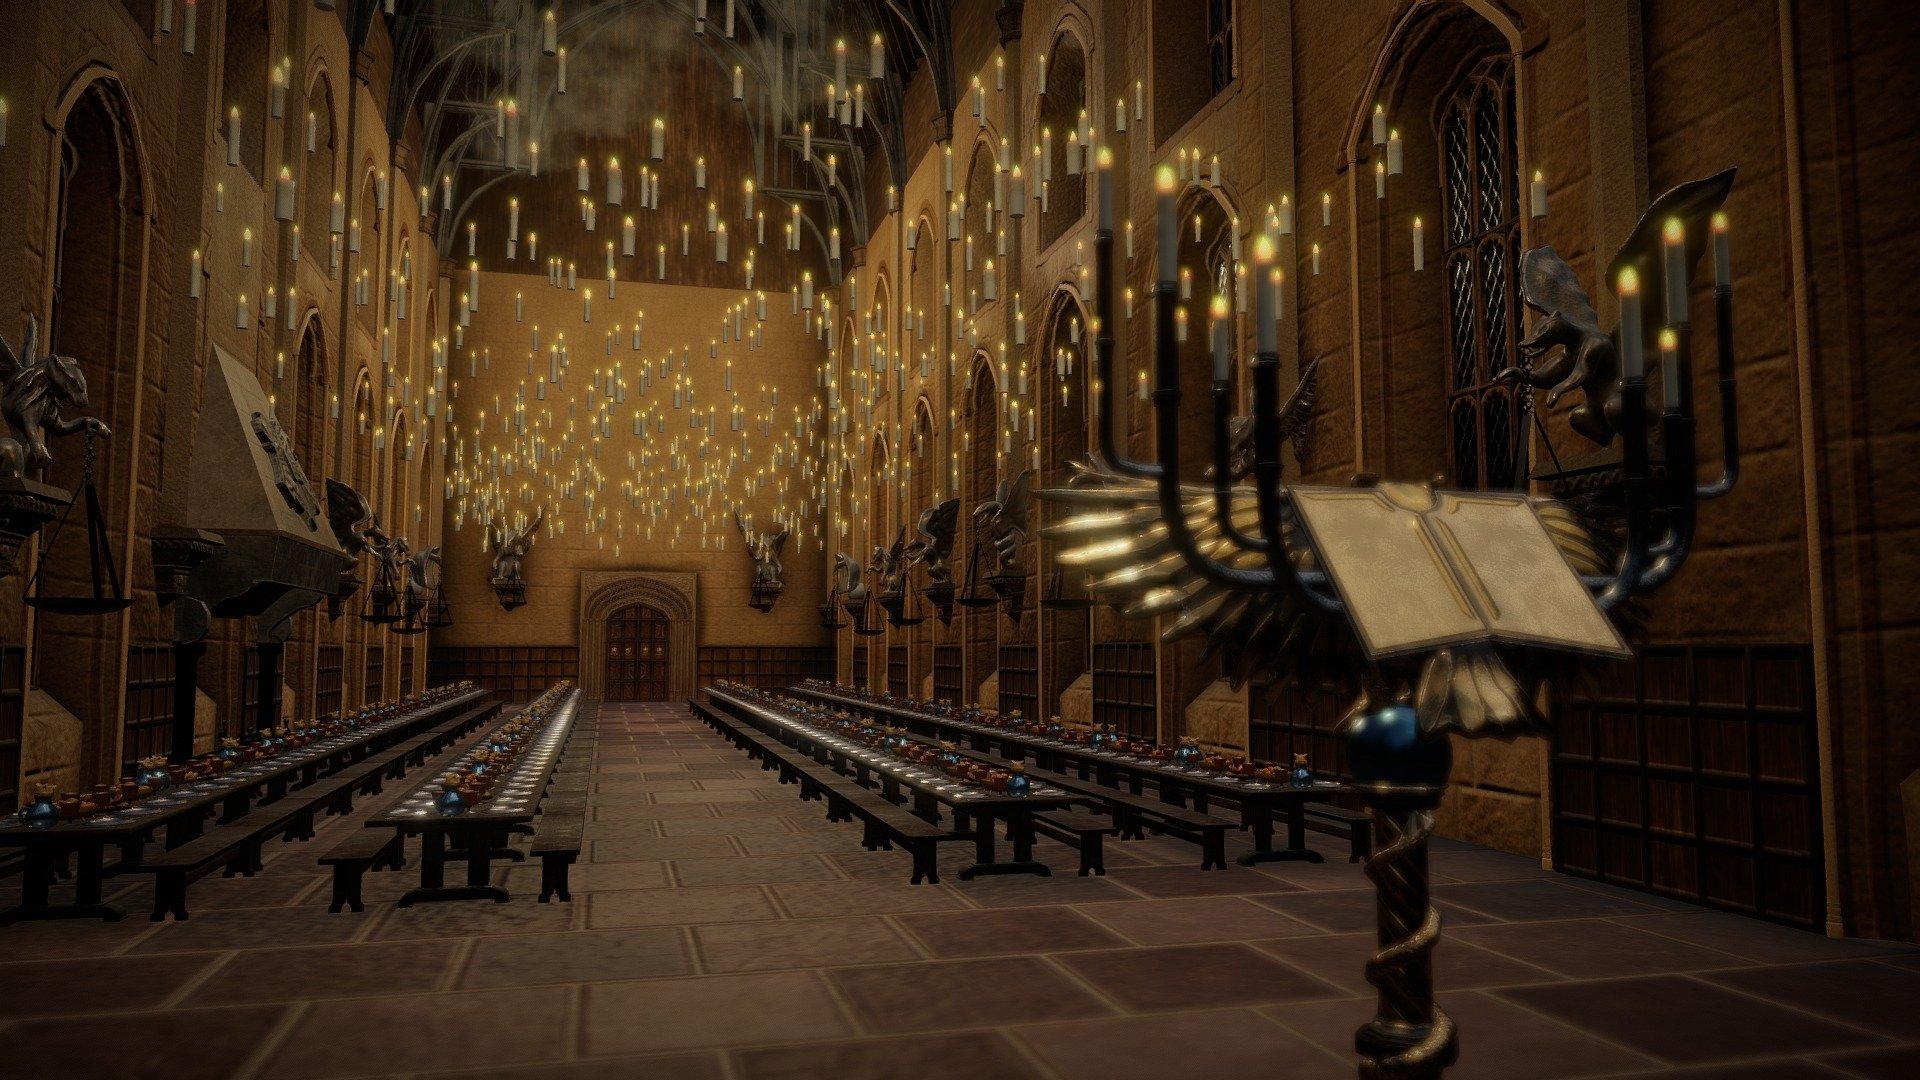 Harry Potter Hogwarts Great Hall Animated Buy Royalty Free